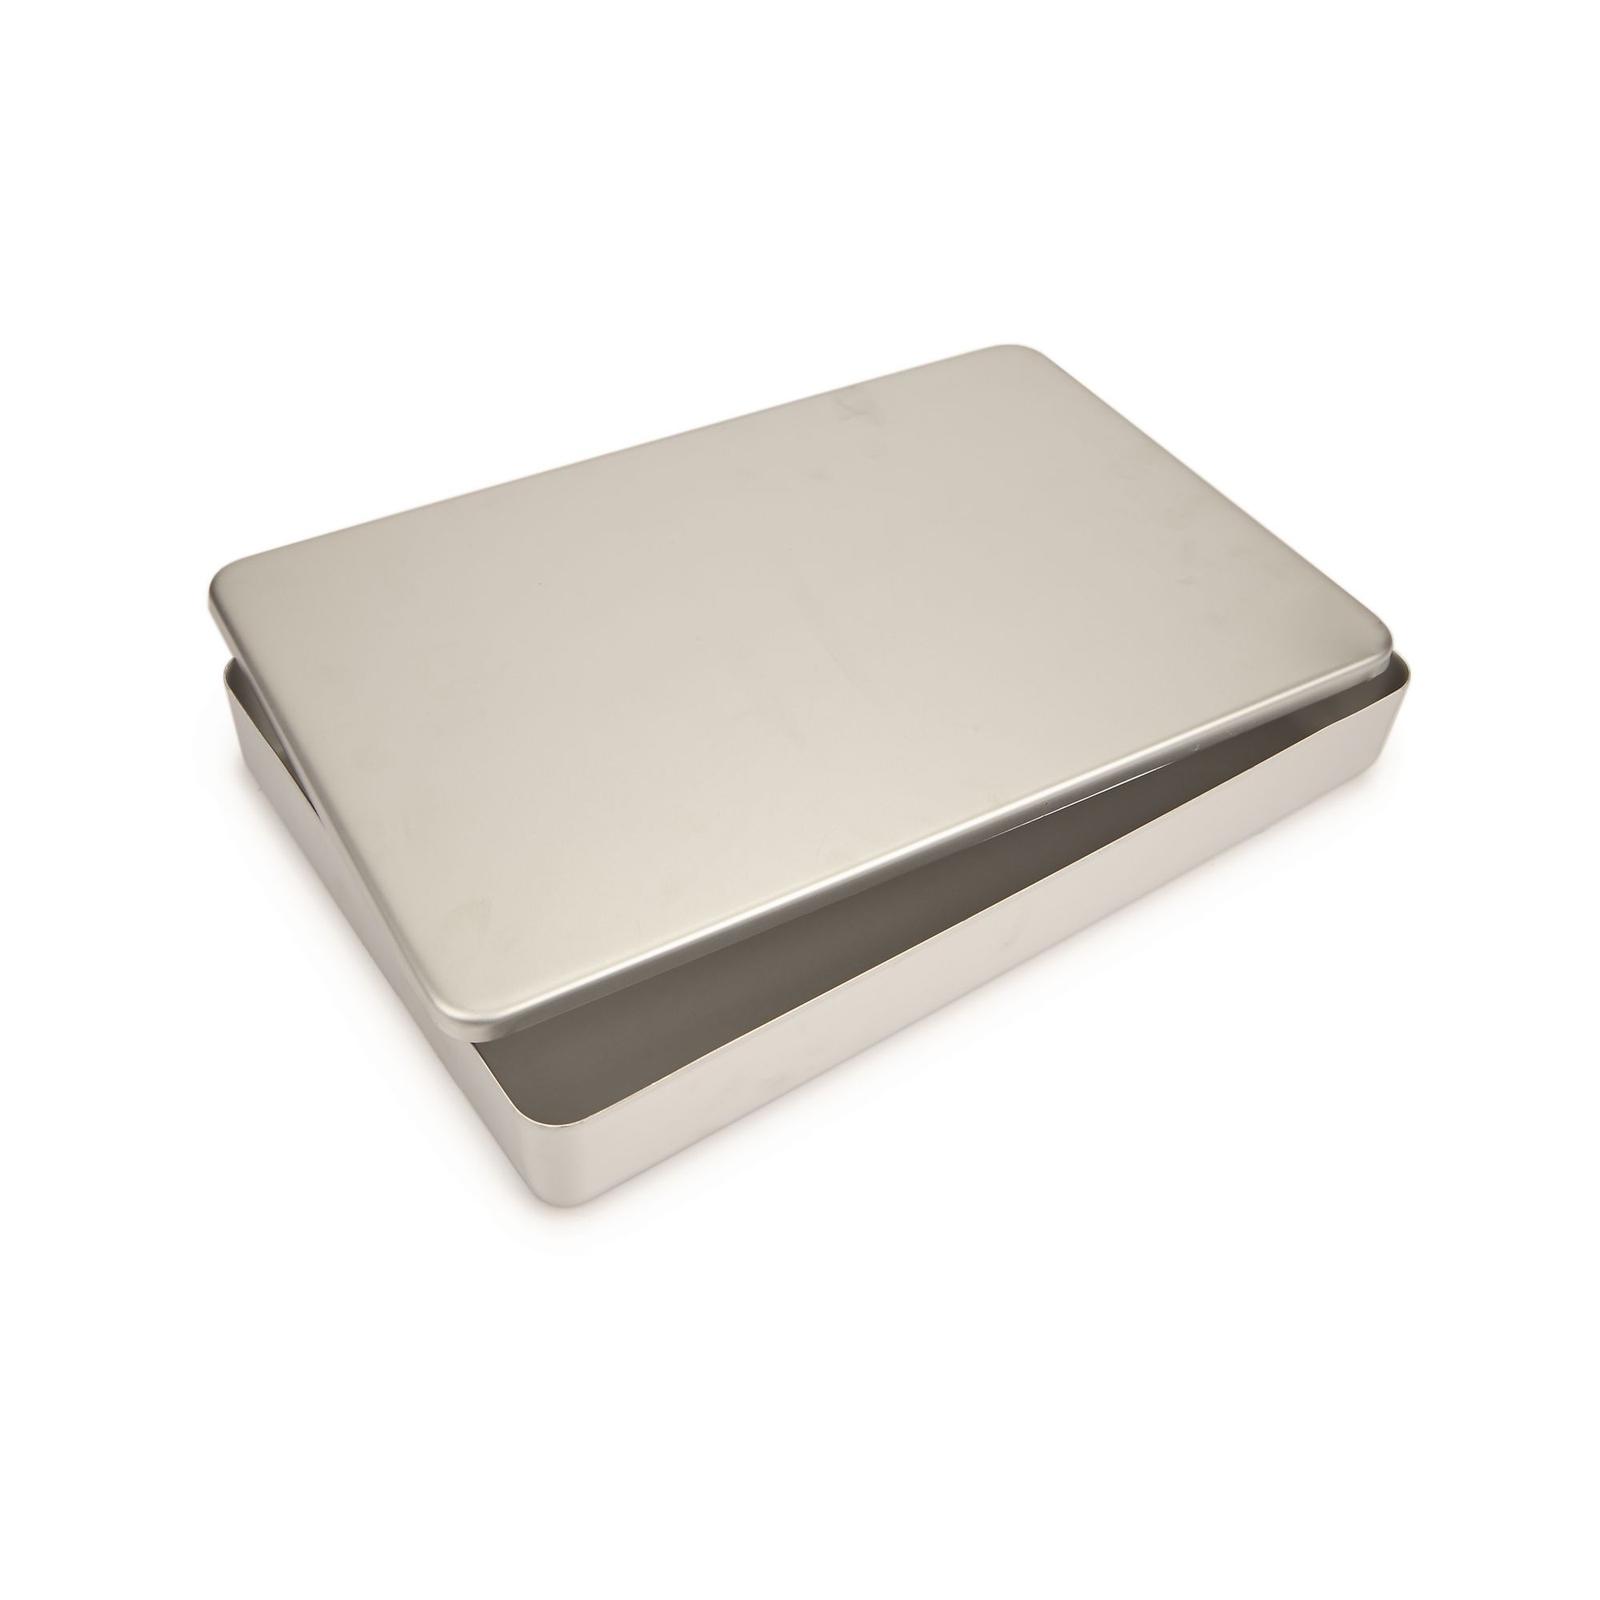 Aluminium Baking Trays with Lid - 83mm